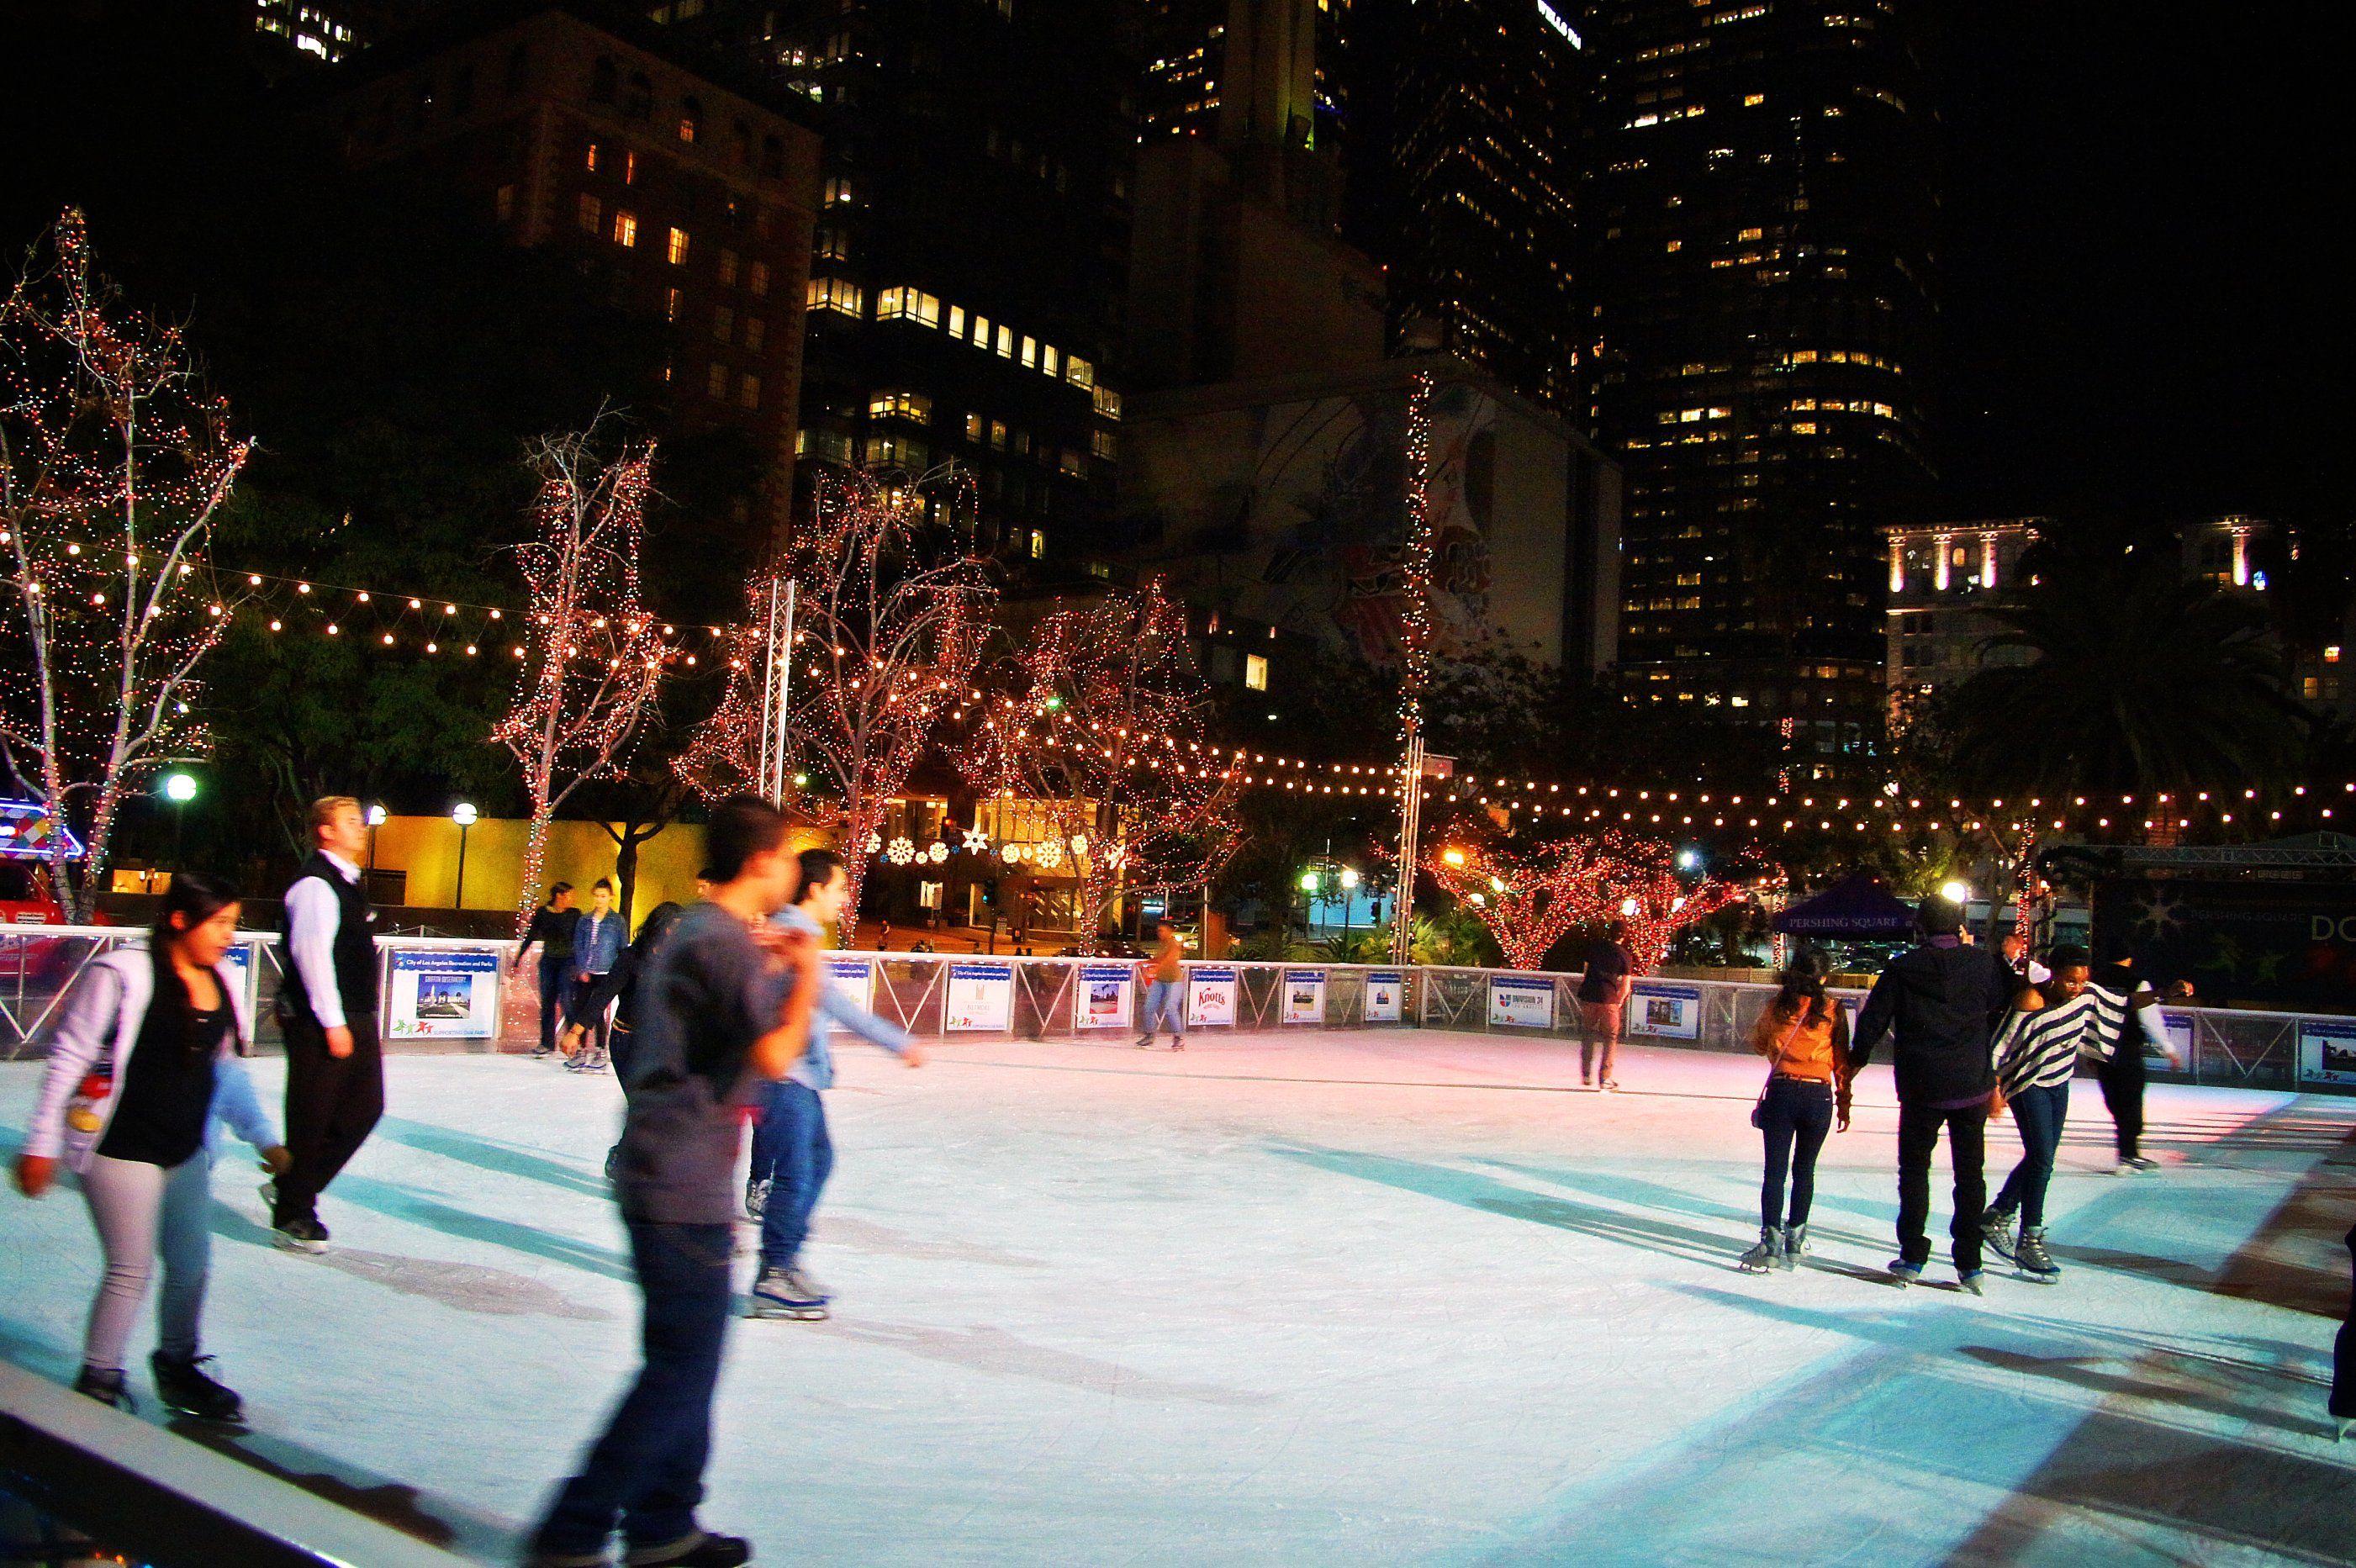 LA Ice Outdoor Ice Skating Rinks in Los Angeles CA